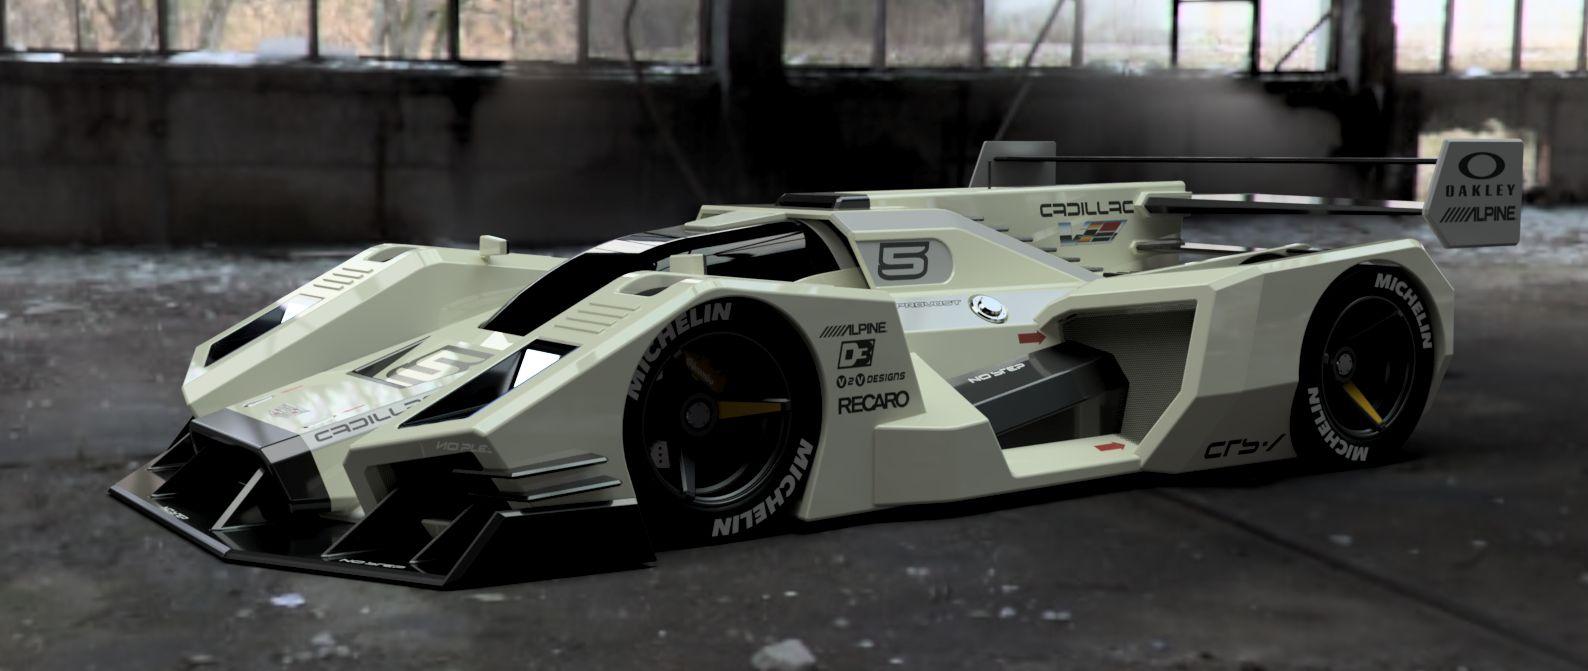 Formula-6-3500-3500